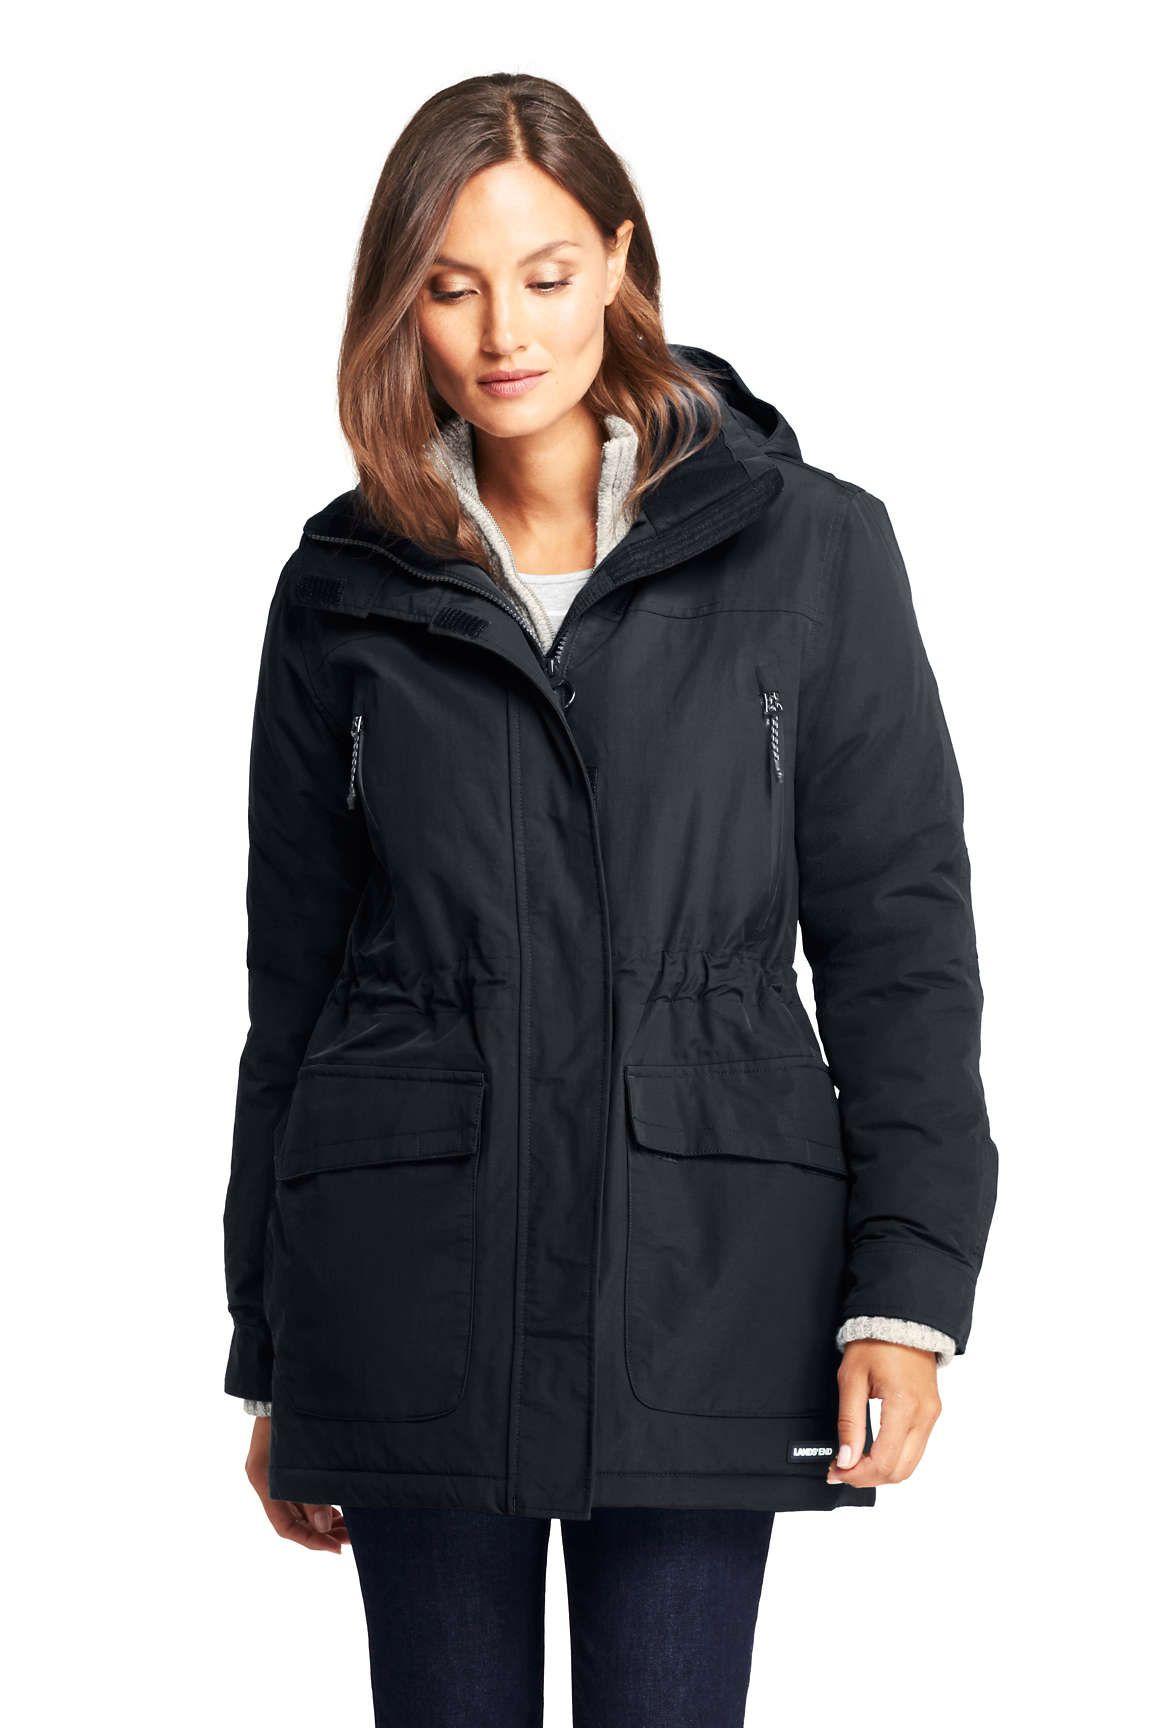 Women S Petite Squall Insulated Winter Parka From Lands End Winter Parka Womens Black Coat Coats Jackets Women [ 1728 x 1152 Pixel ]